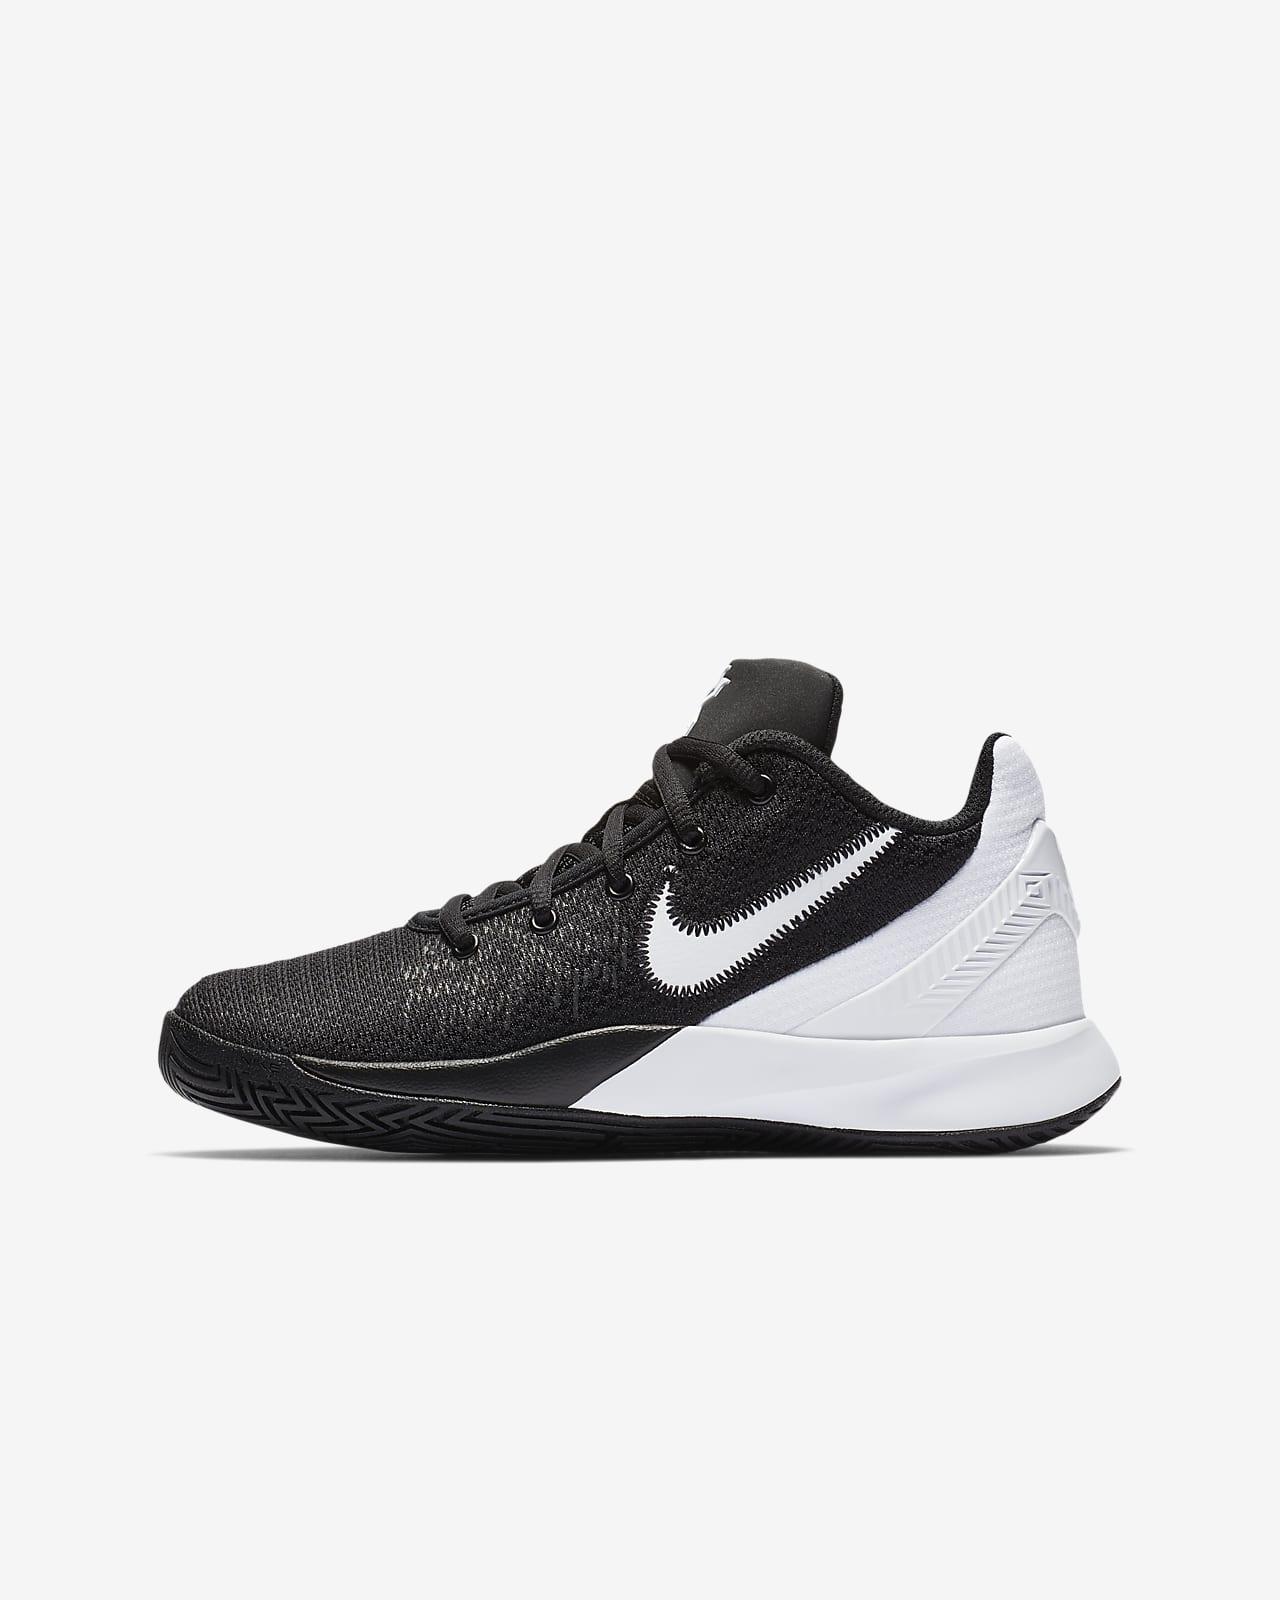 Kyrie Flytrap II (GS) 大童篮球童鞋